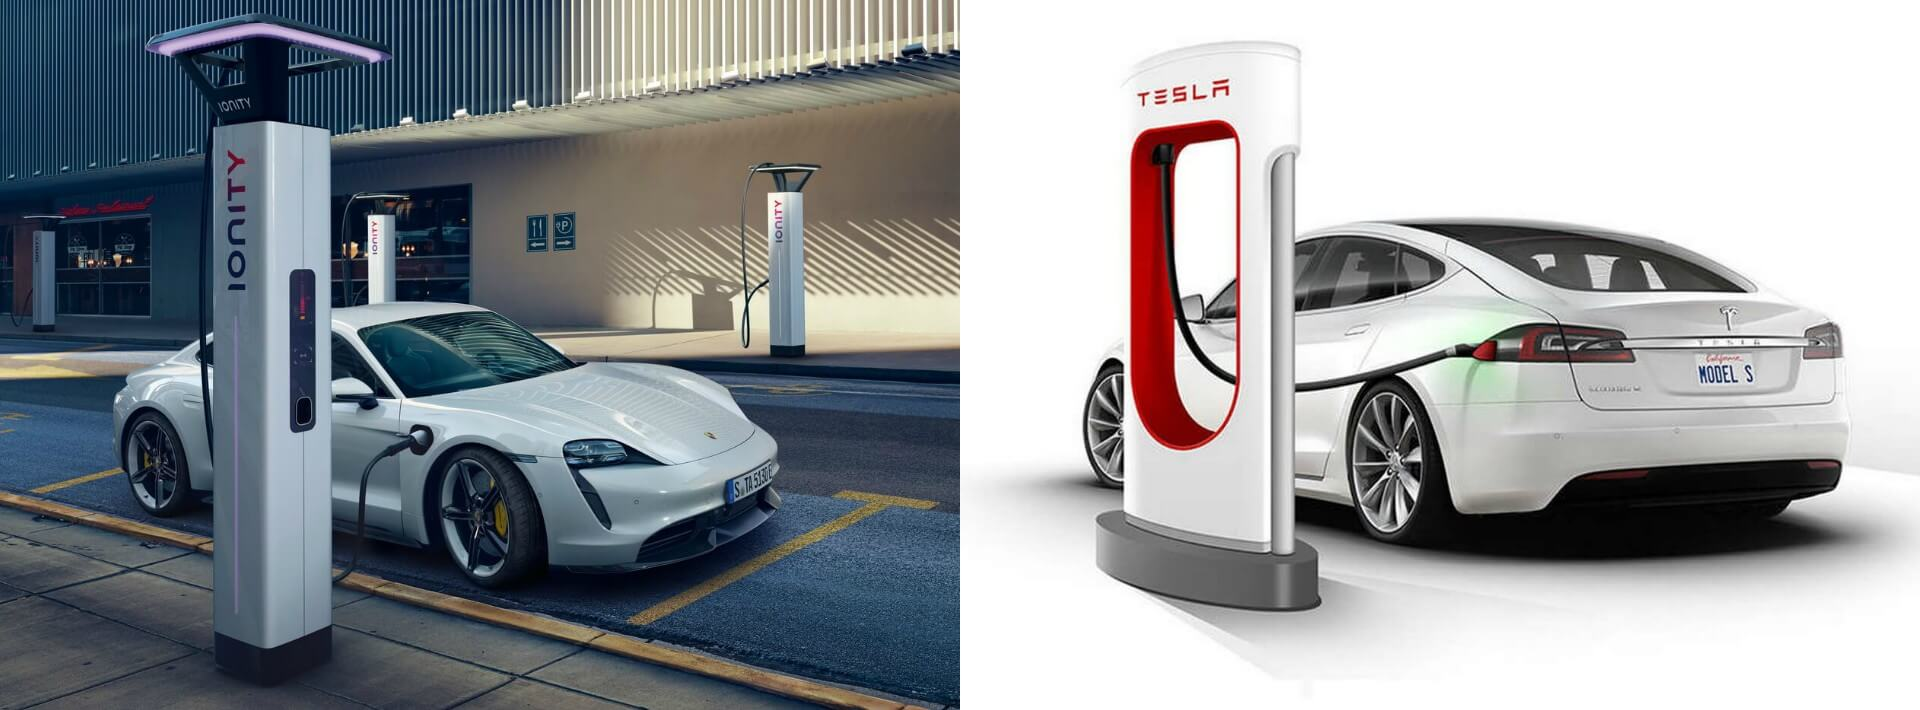 Porsche Taycan заряжается на европейской зарядной станции Ionity и Tesla ModelS на станции Supercharger